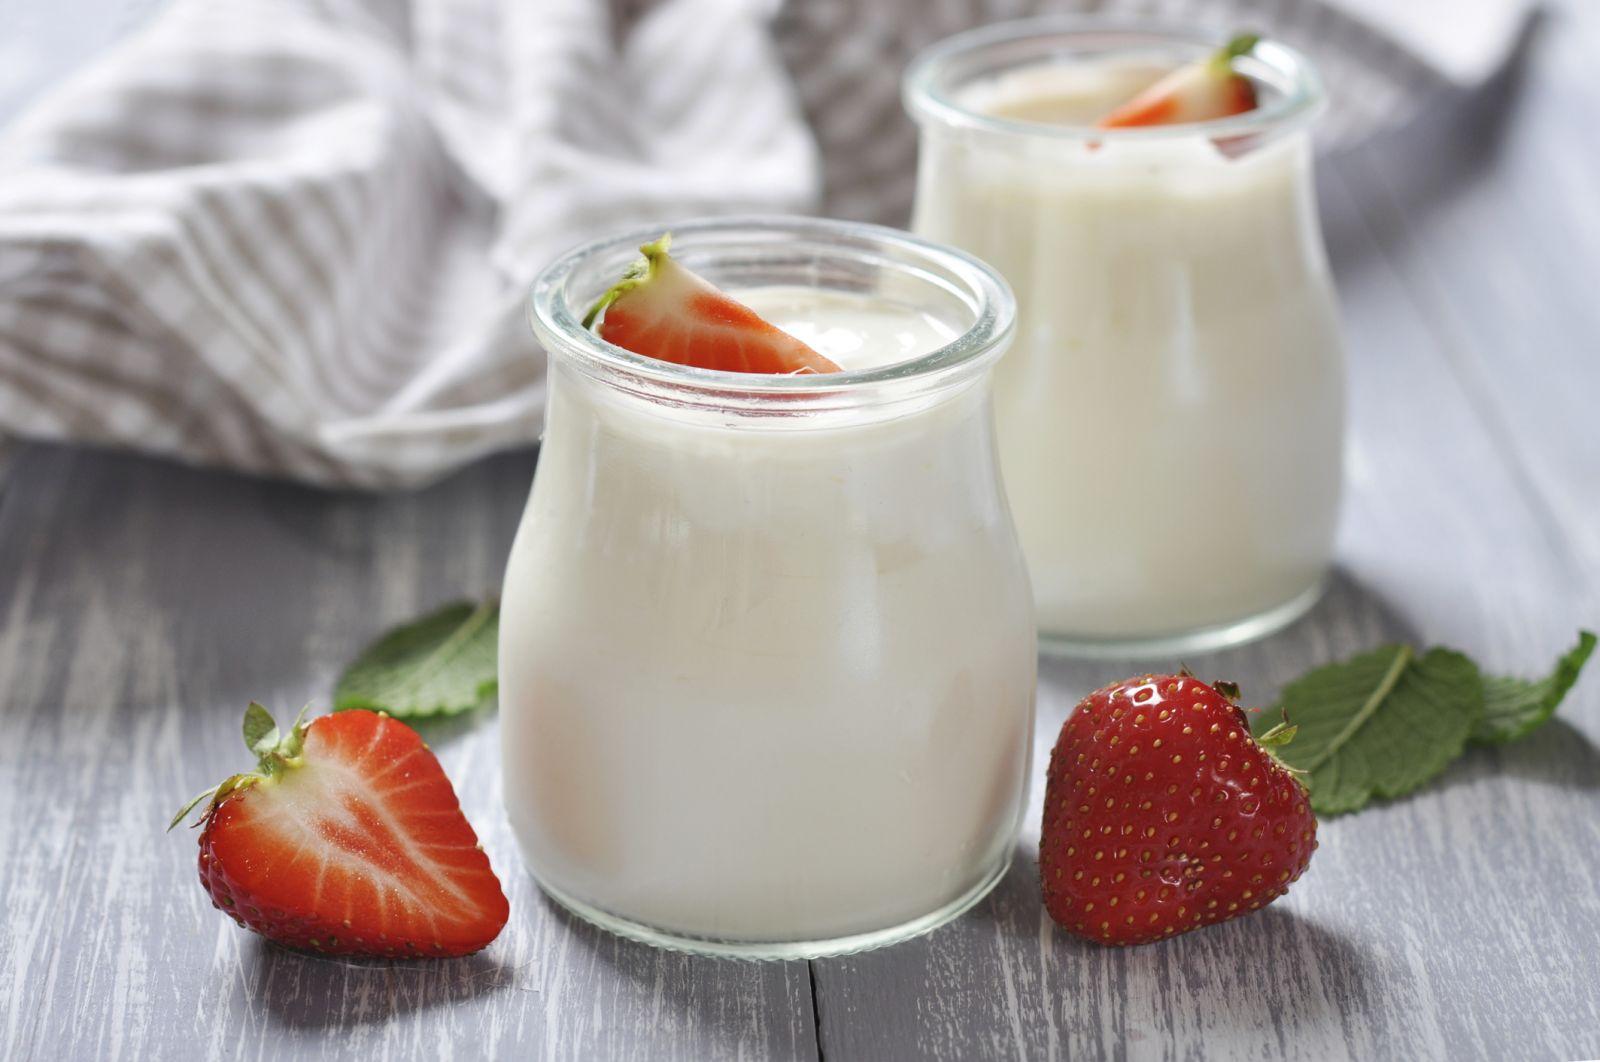 Sữa chua chứa nhiều lợi khuẩn có lợi cho sức khỏe